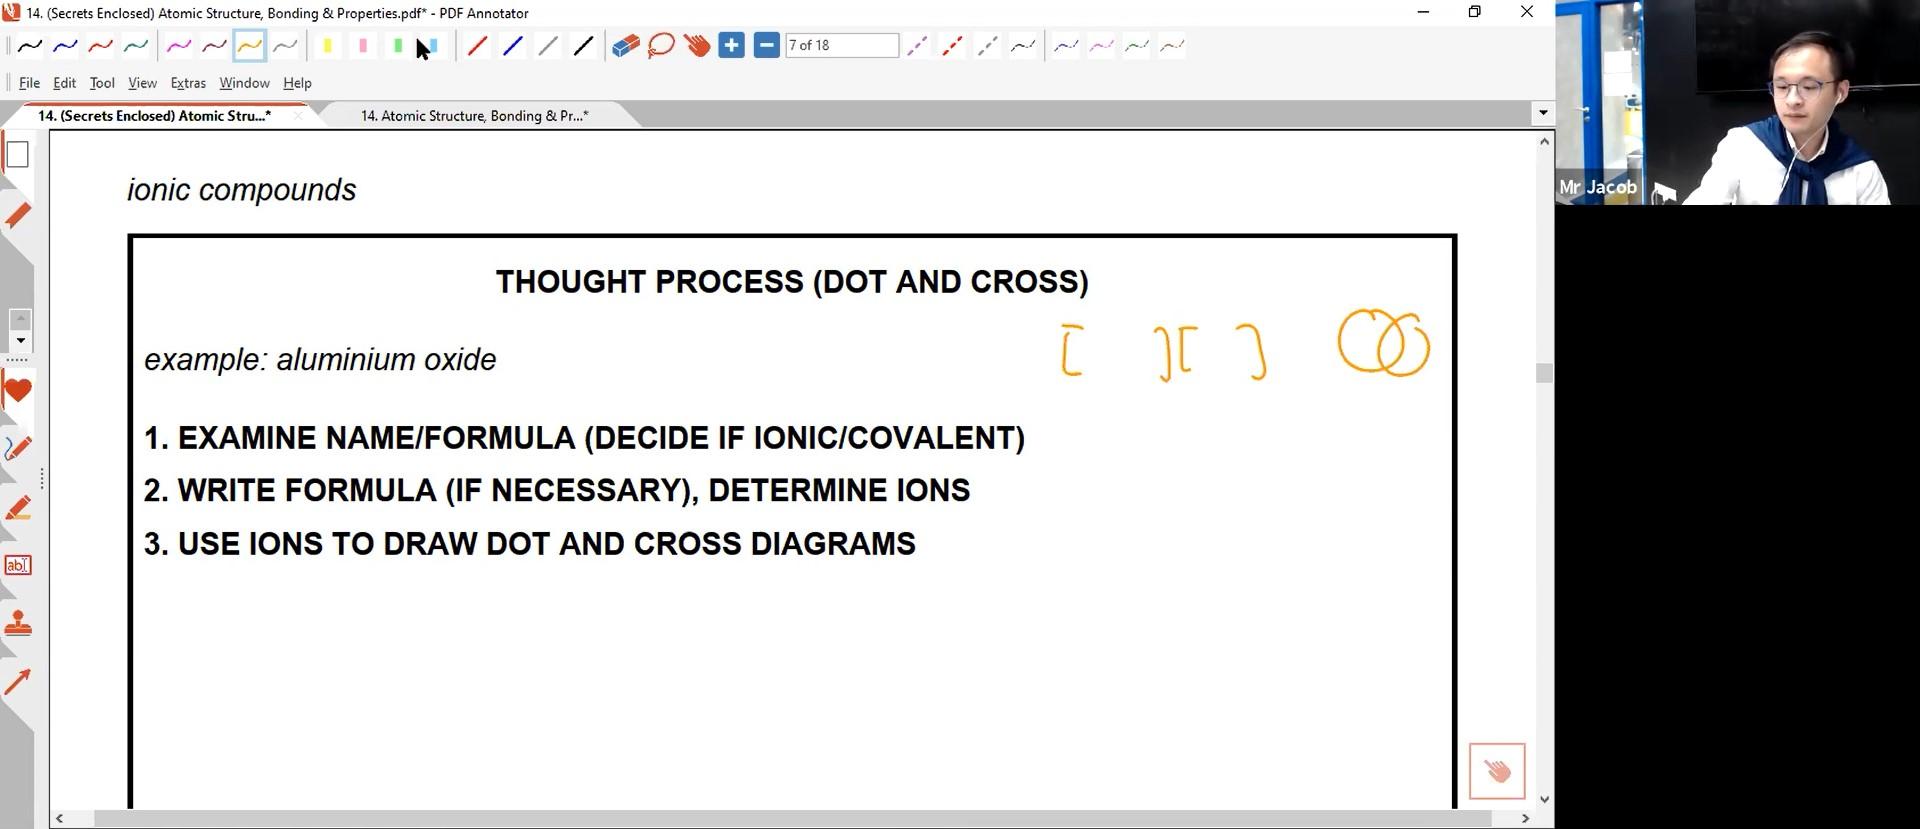 24. EOY - Atomic Structure, Chem Bonding & Structure of Matter I